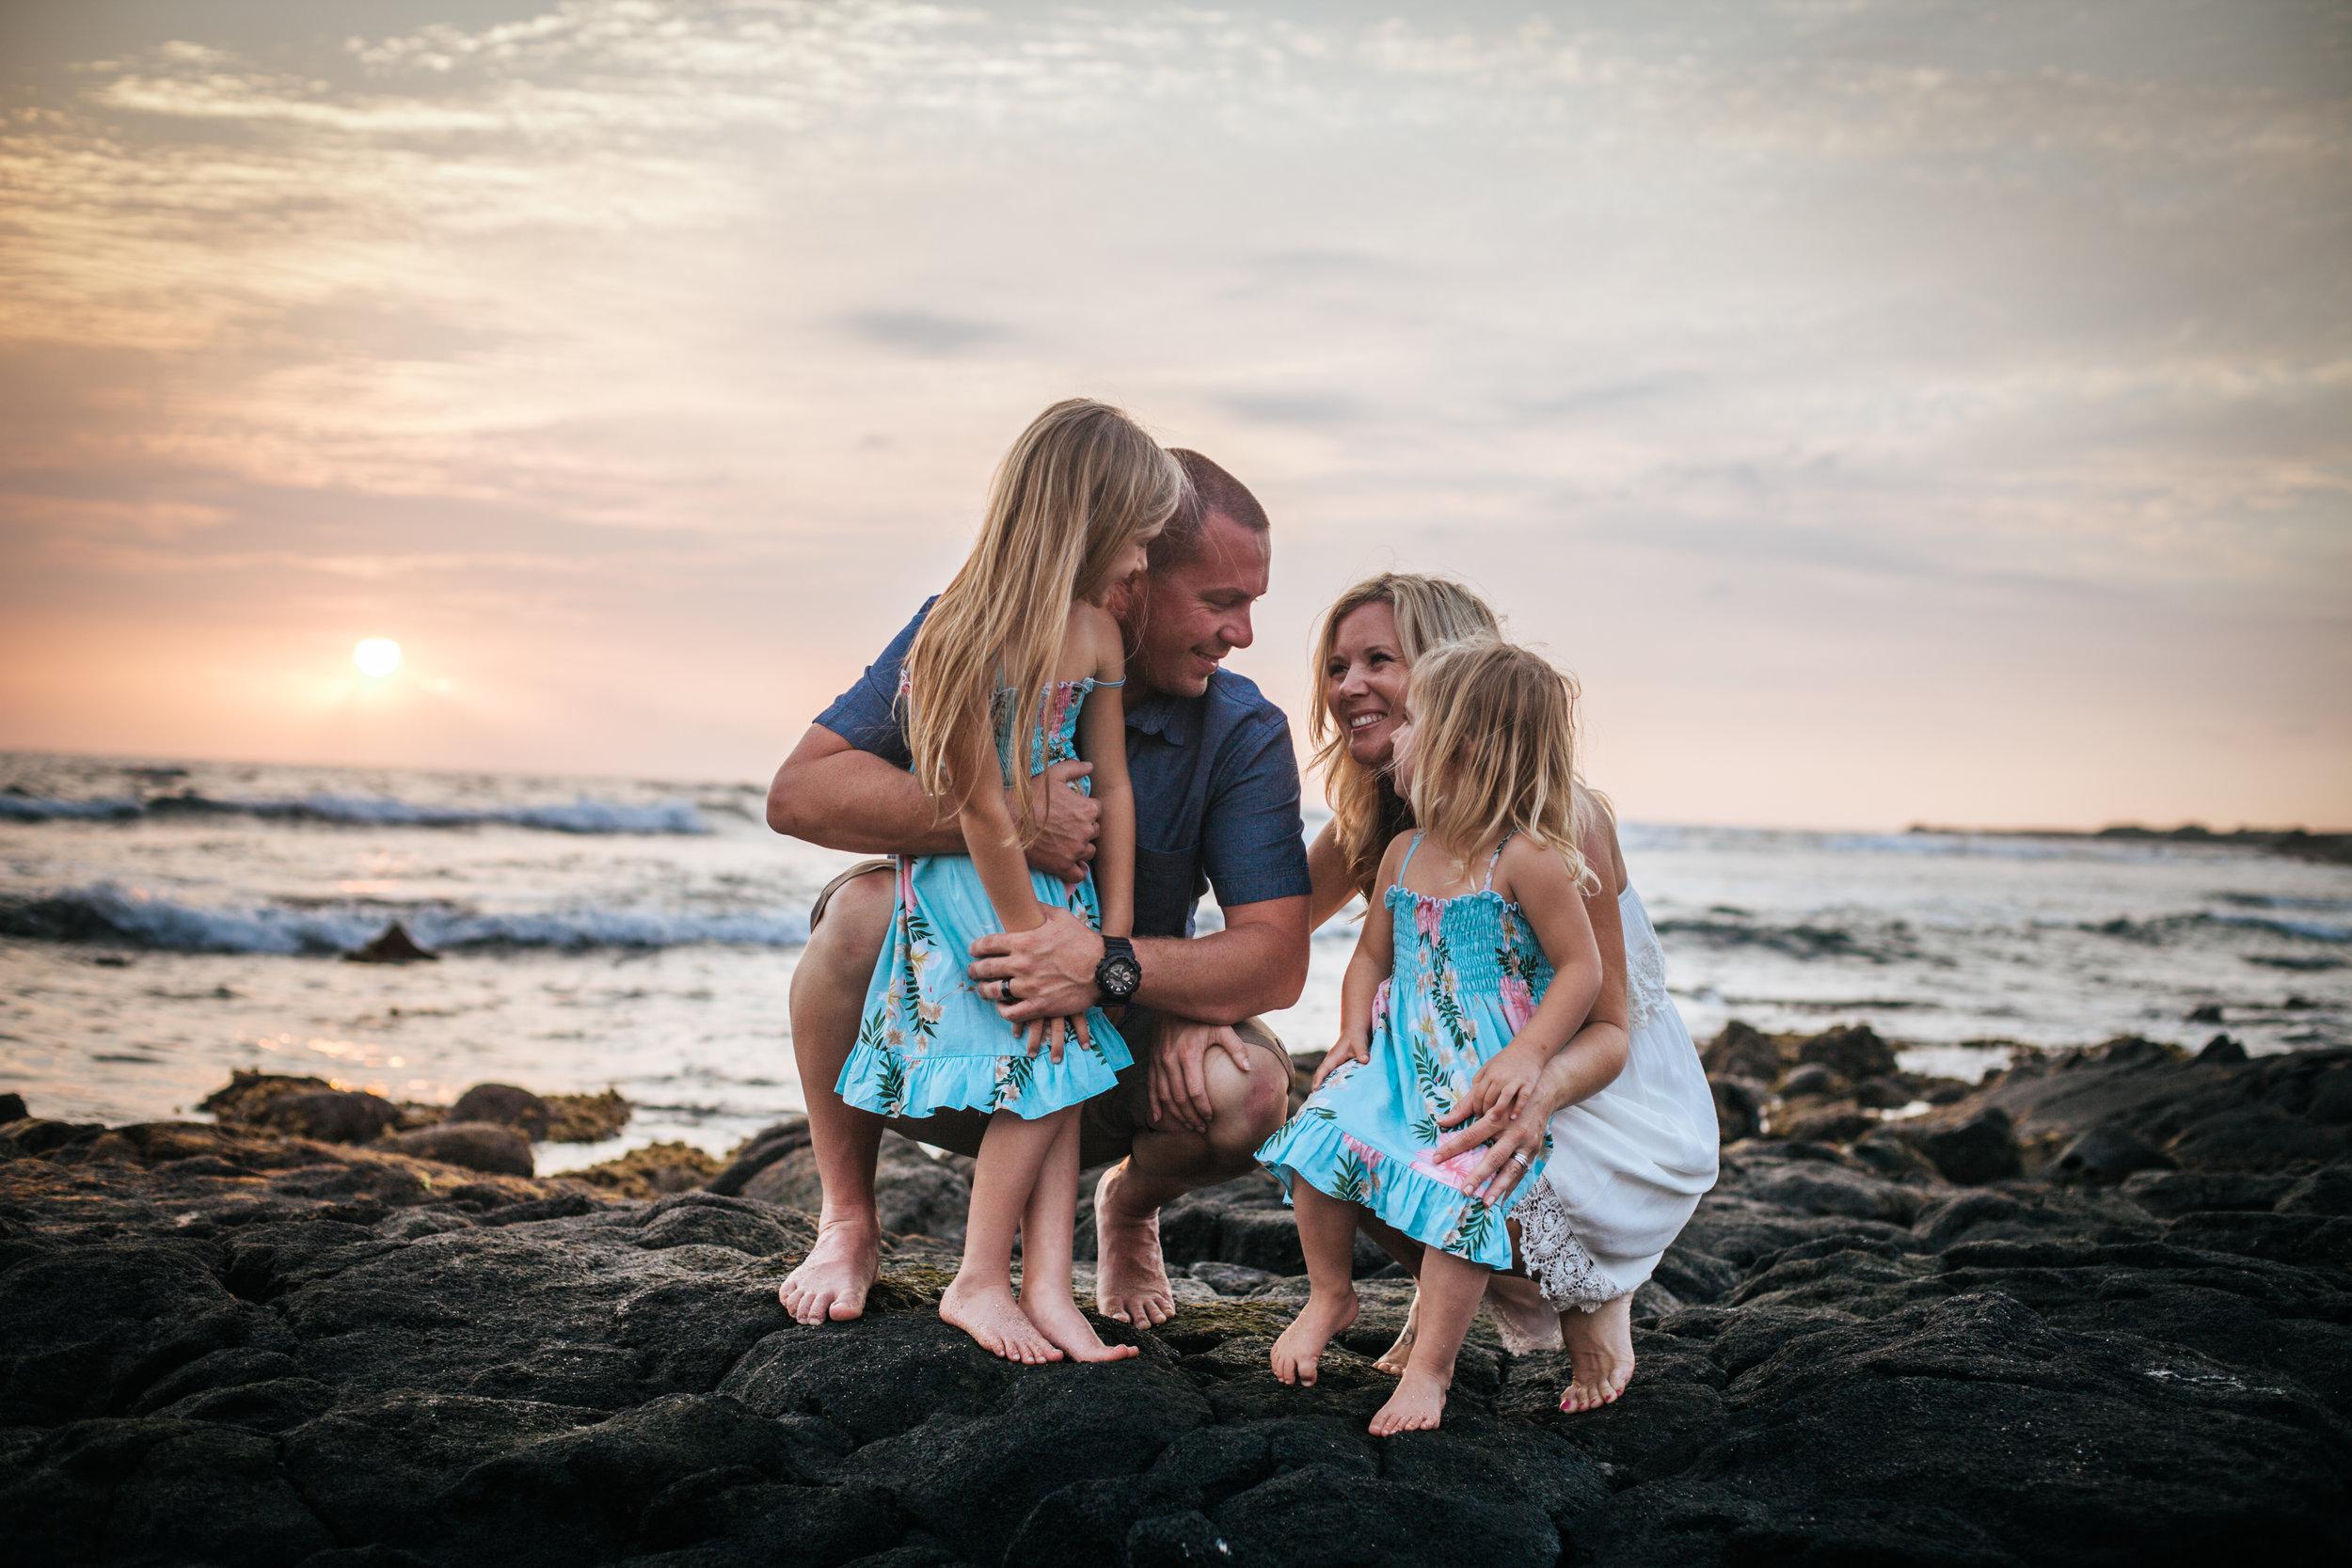 big island hawaii old kona airport beach family © kelilina photography 20170221181654.jpg